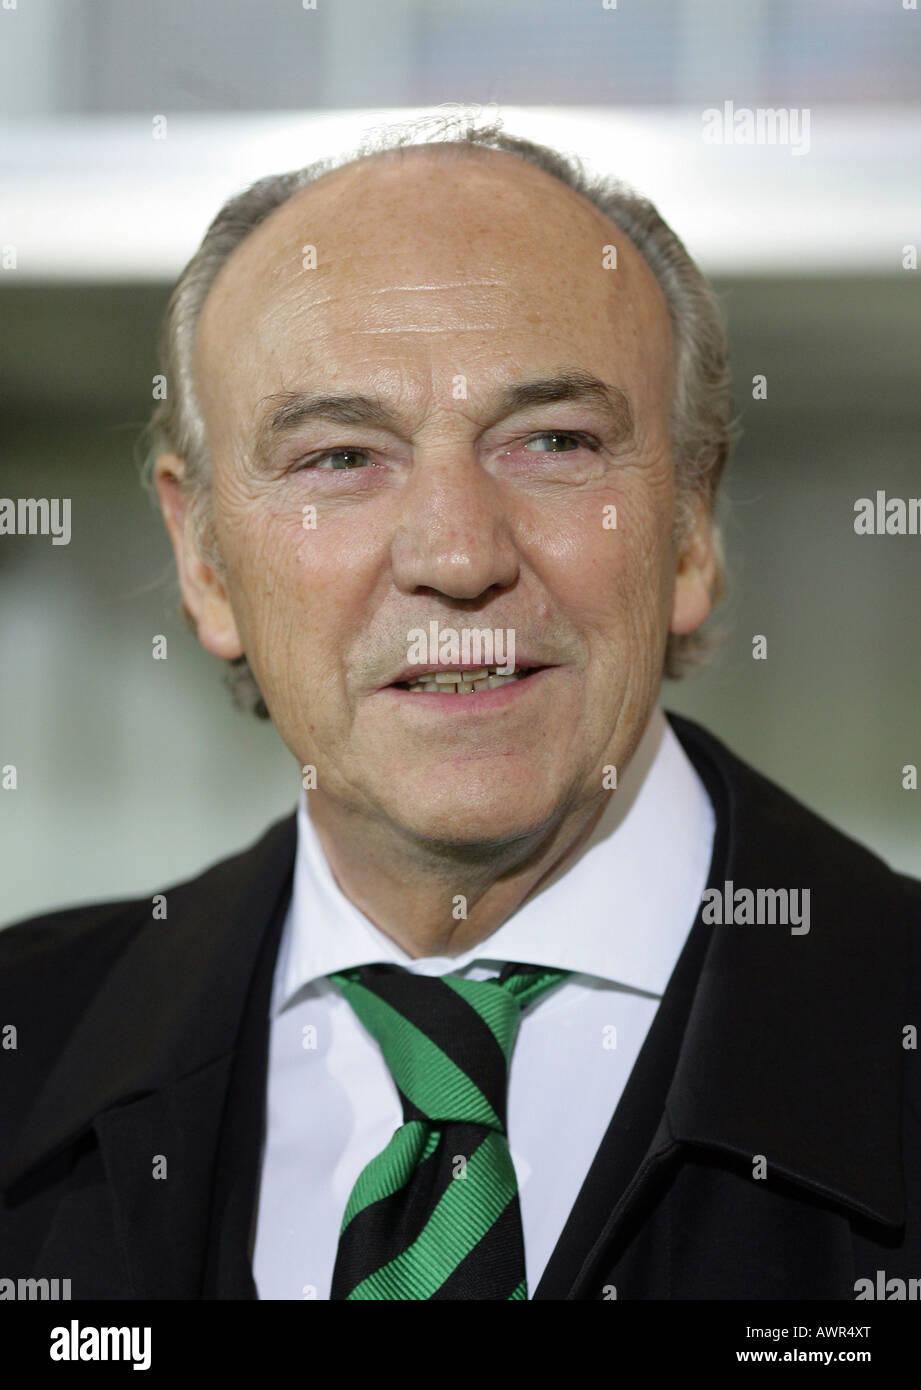 President of the german soccer club Borrussia Moenchengladbach Rolf Koenigs Stock Photo